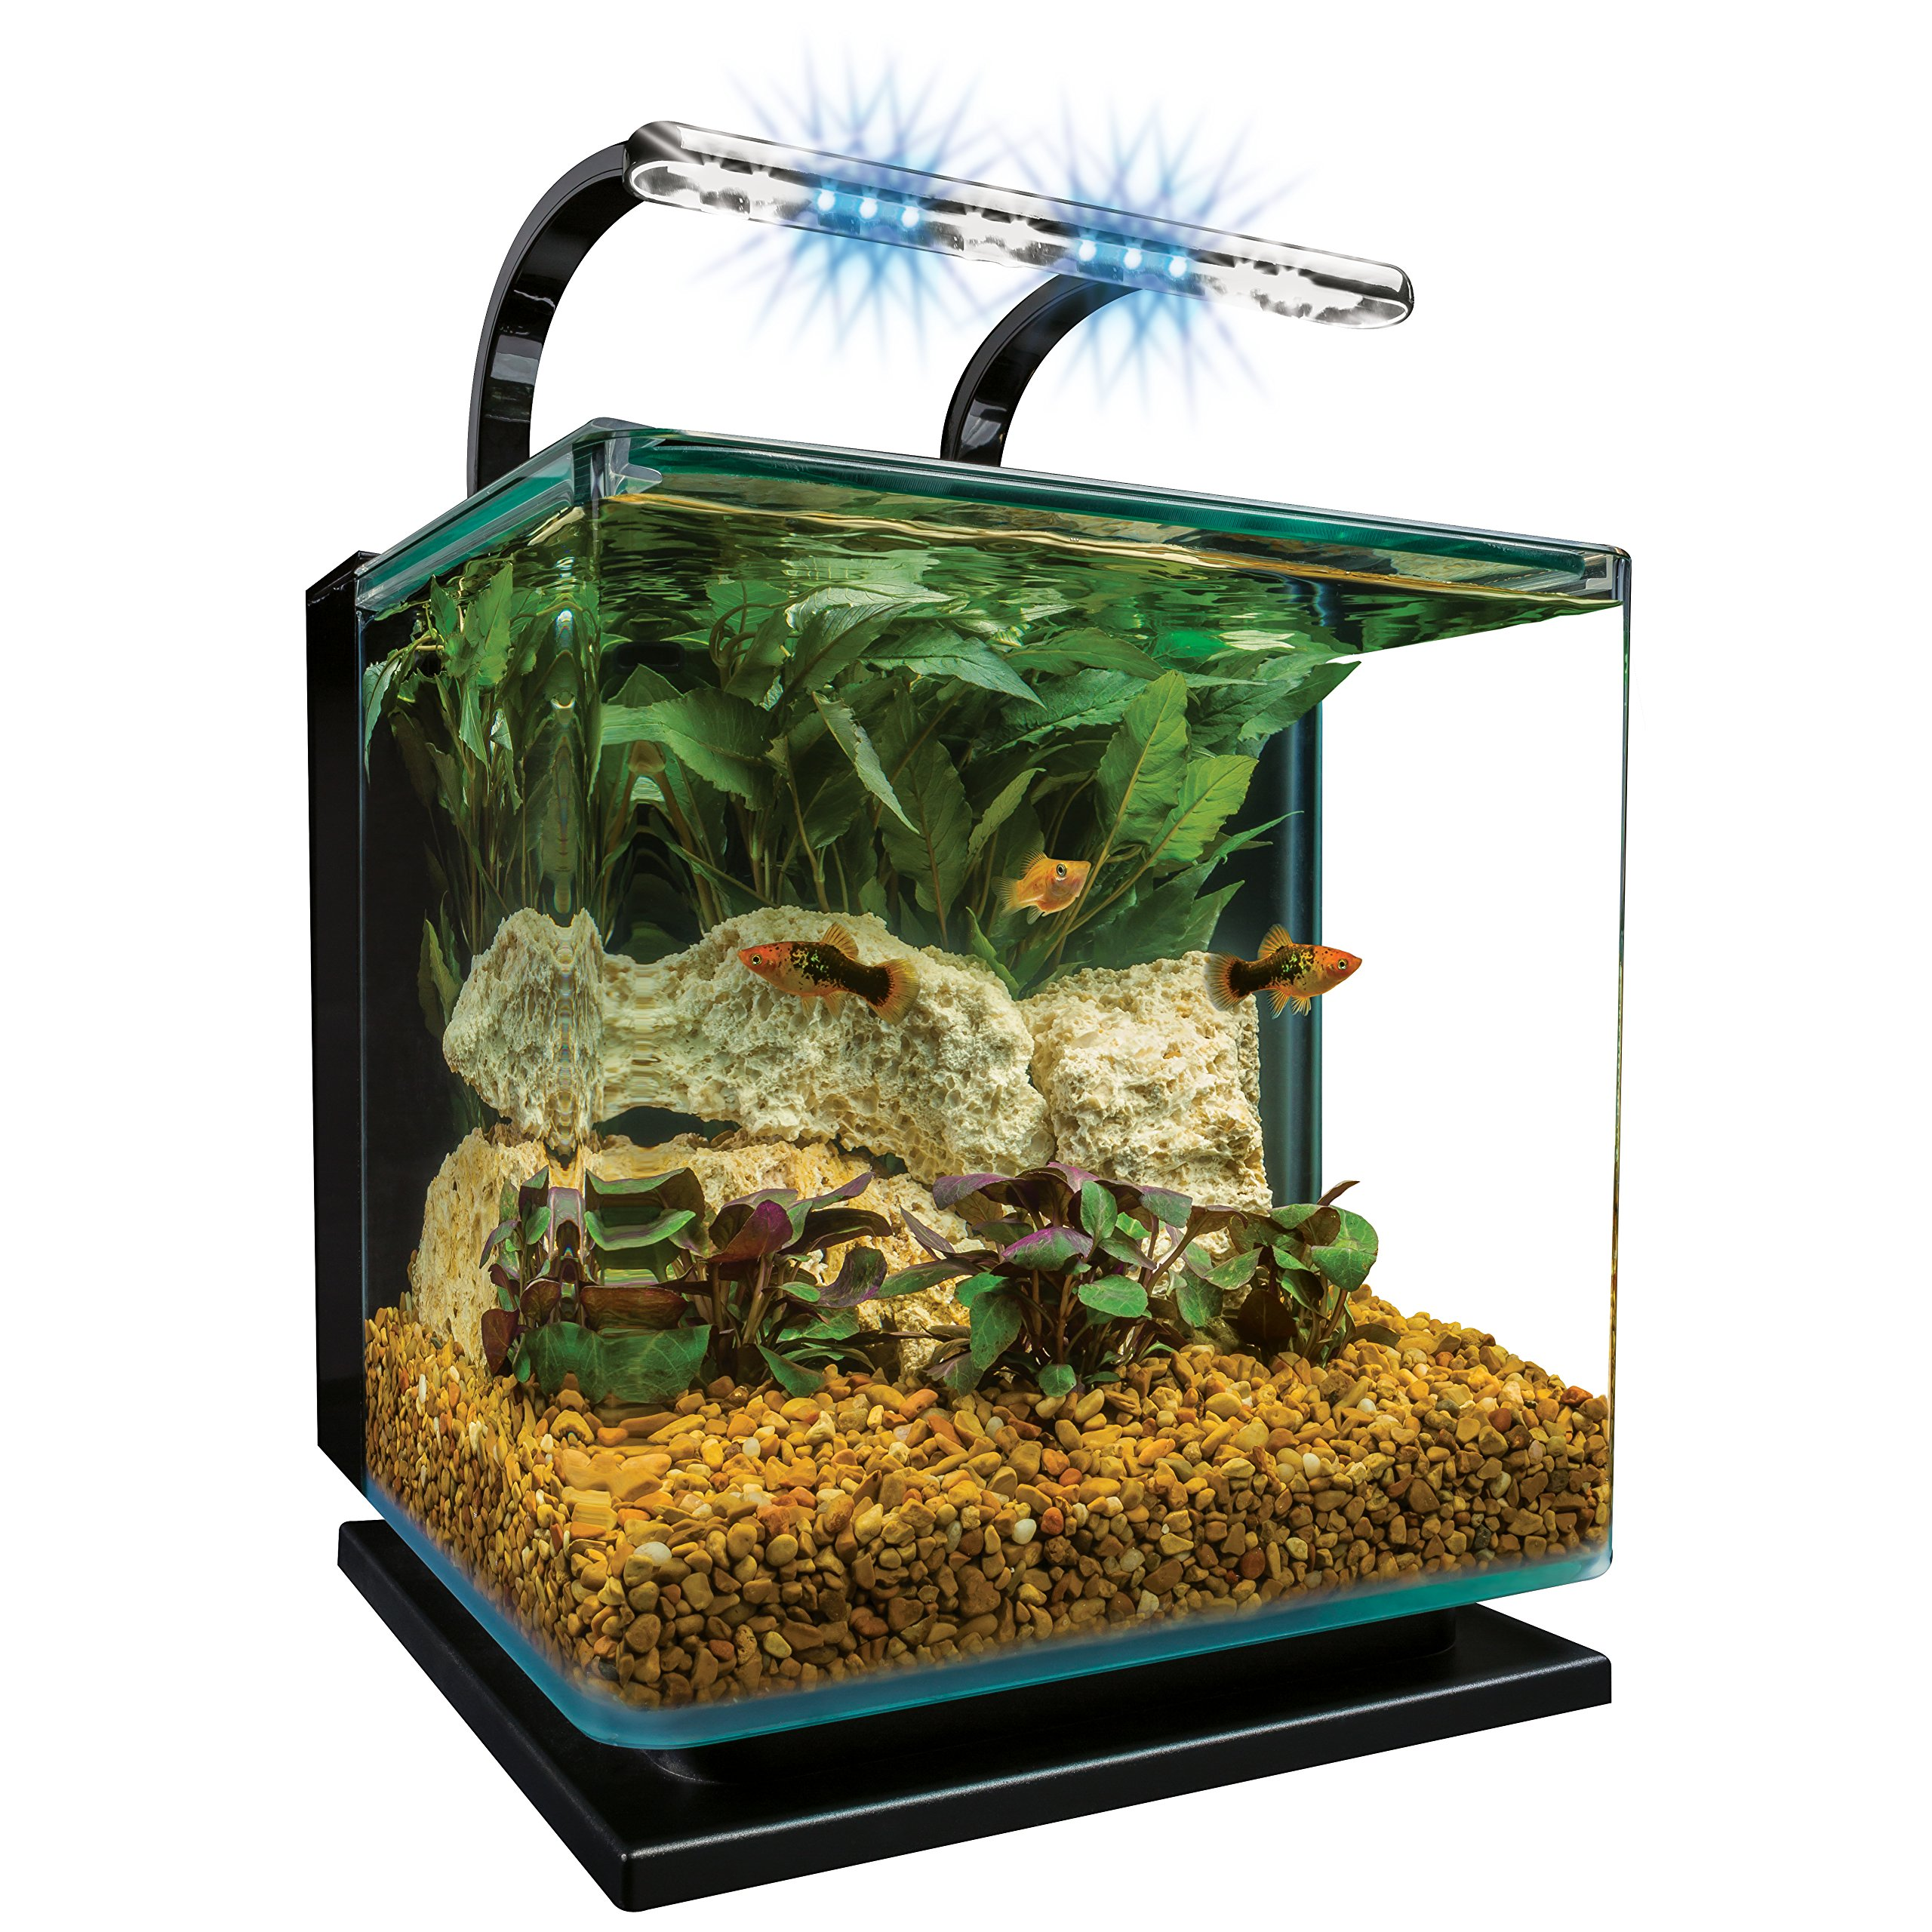 Marineland Contour Glass Aquarium Kit with Rail Light by MarineLand